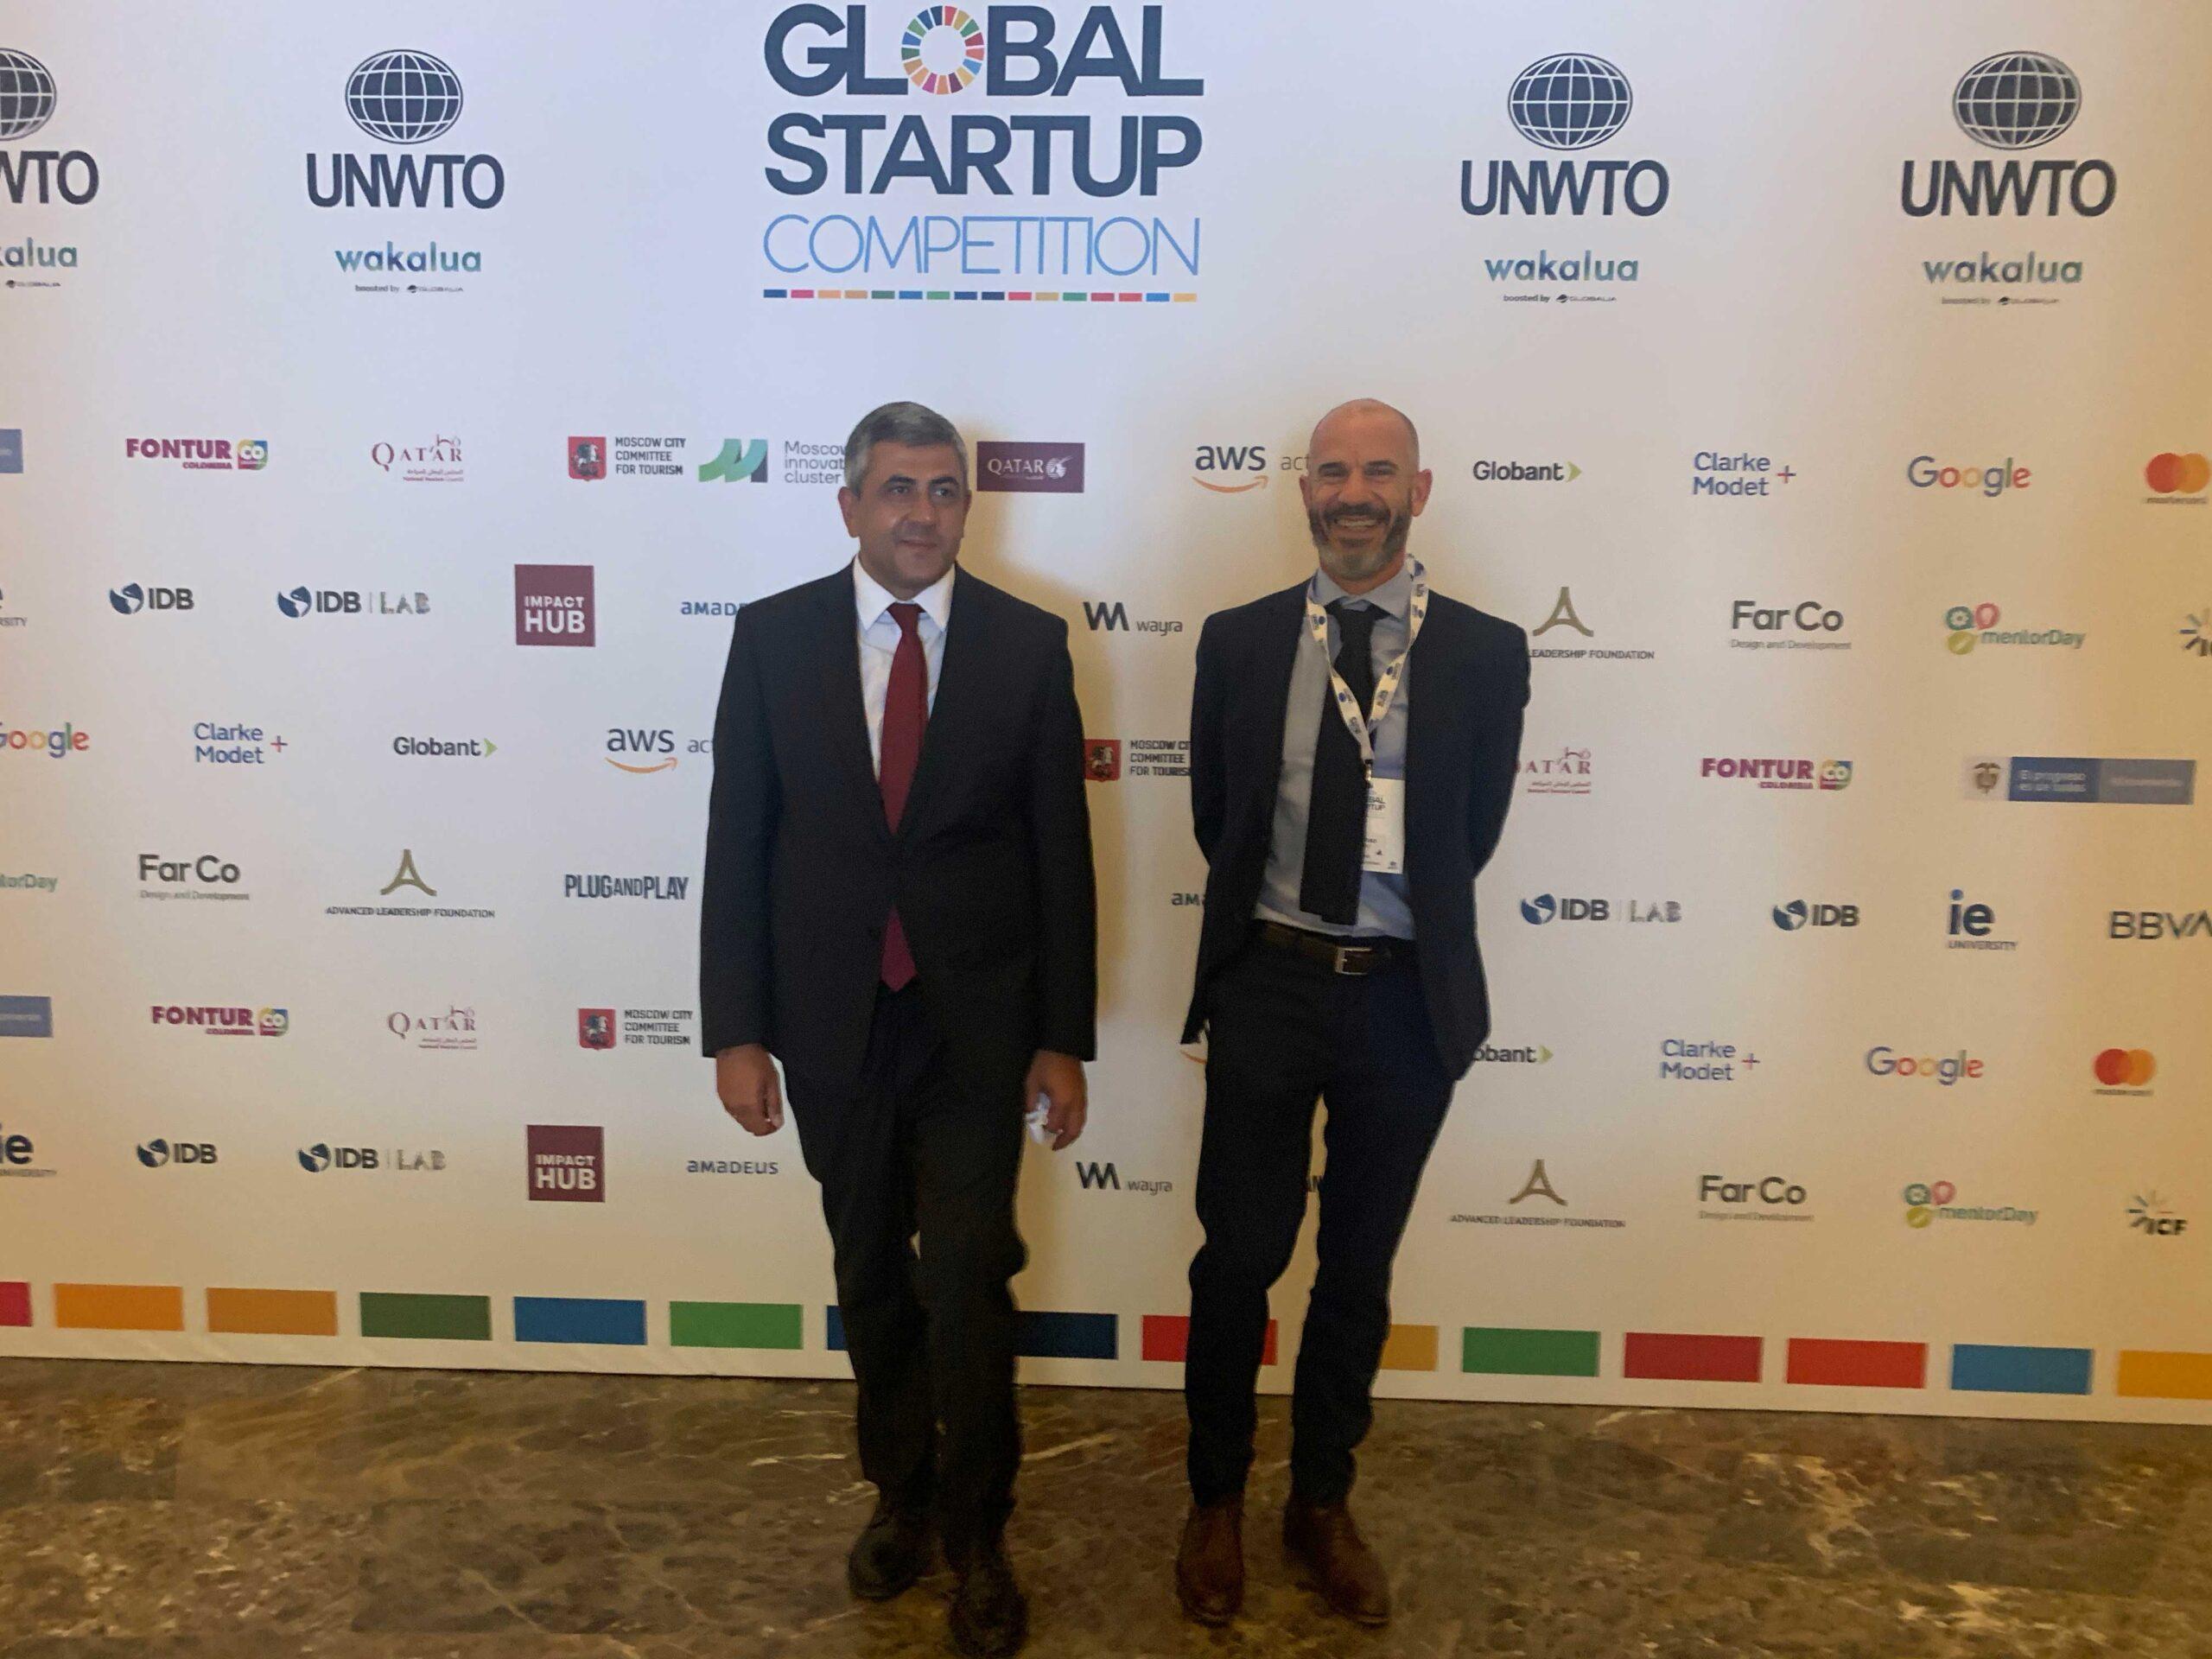 UNWTO & Alteria Automation